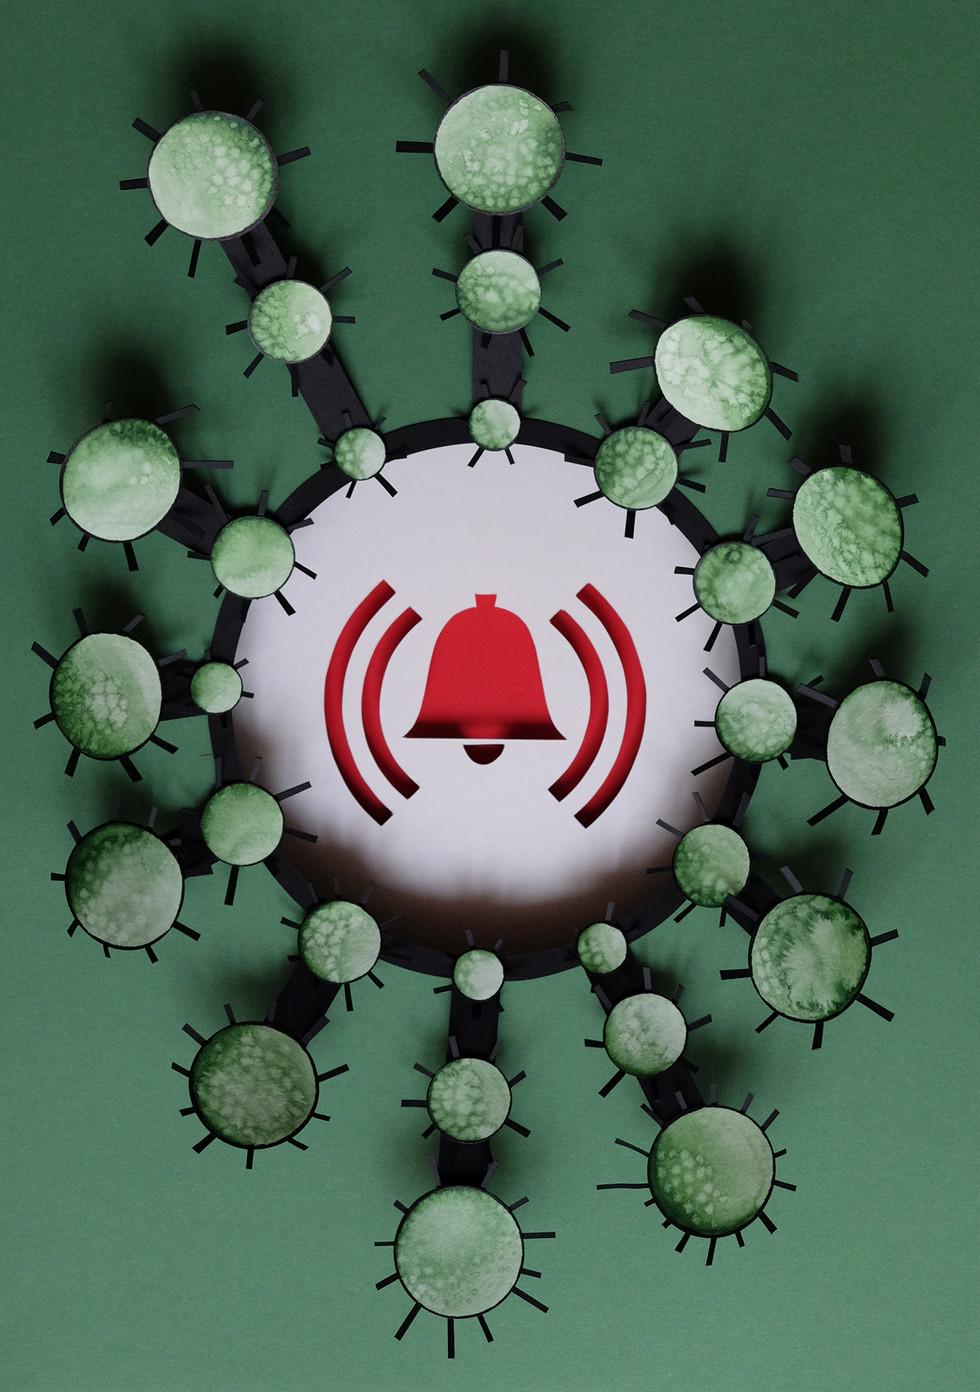 Virusalarm 2020